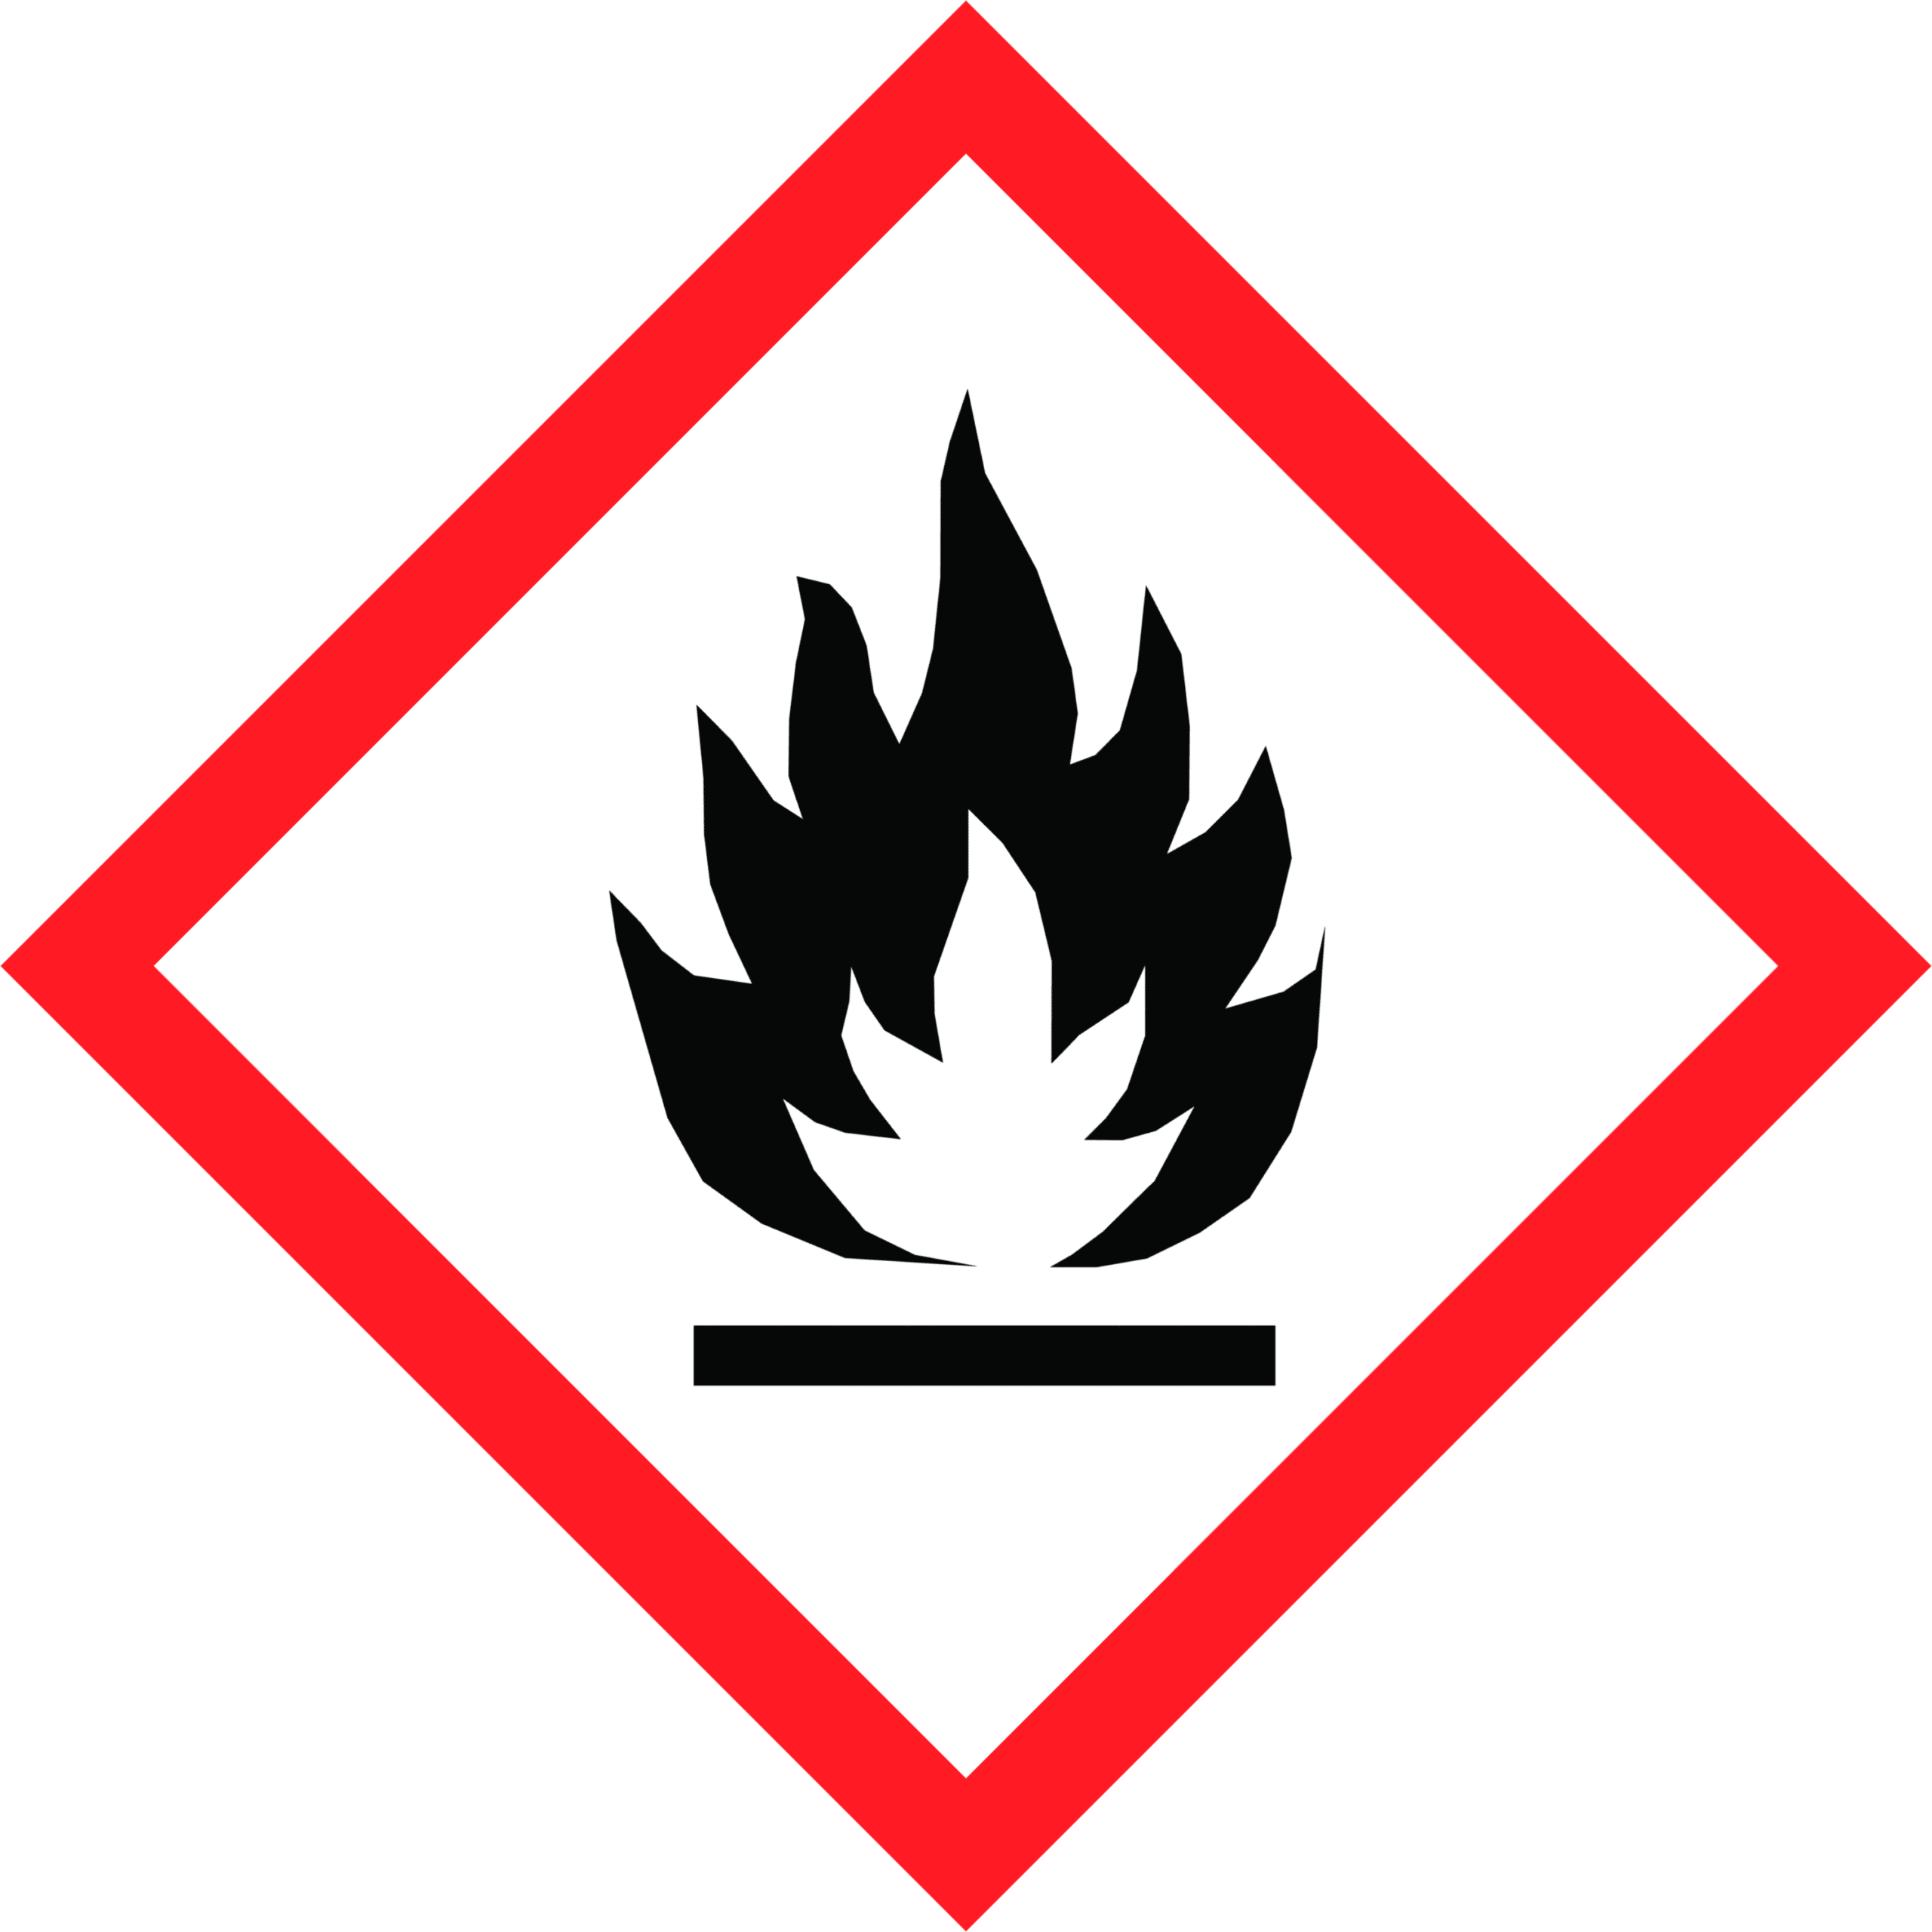 Gefahrensymbol - GHS02